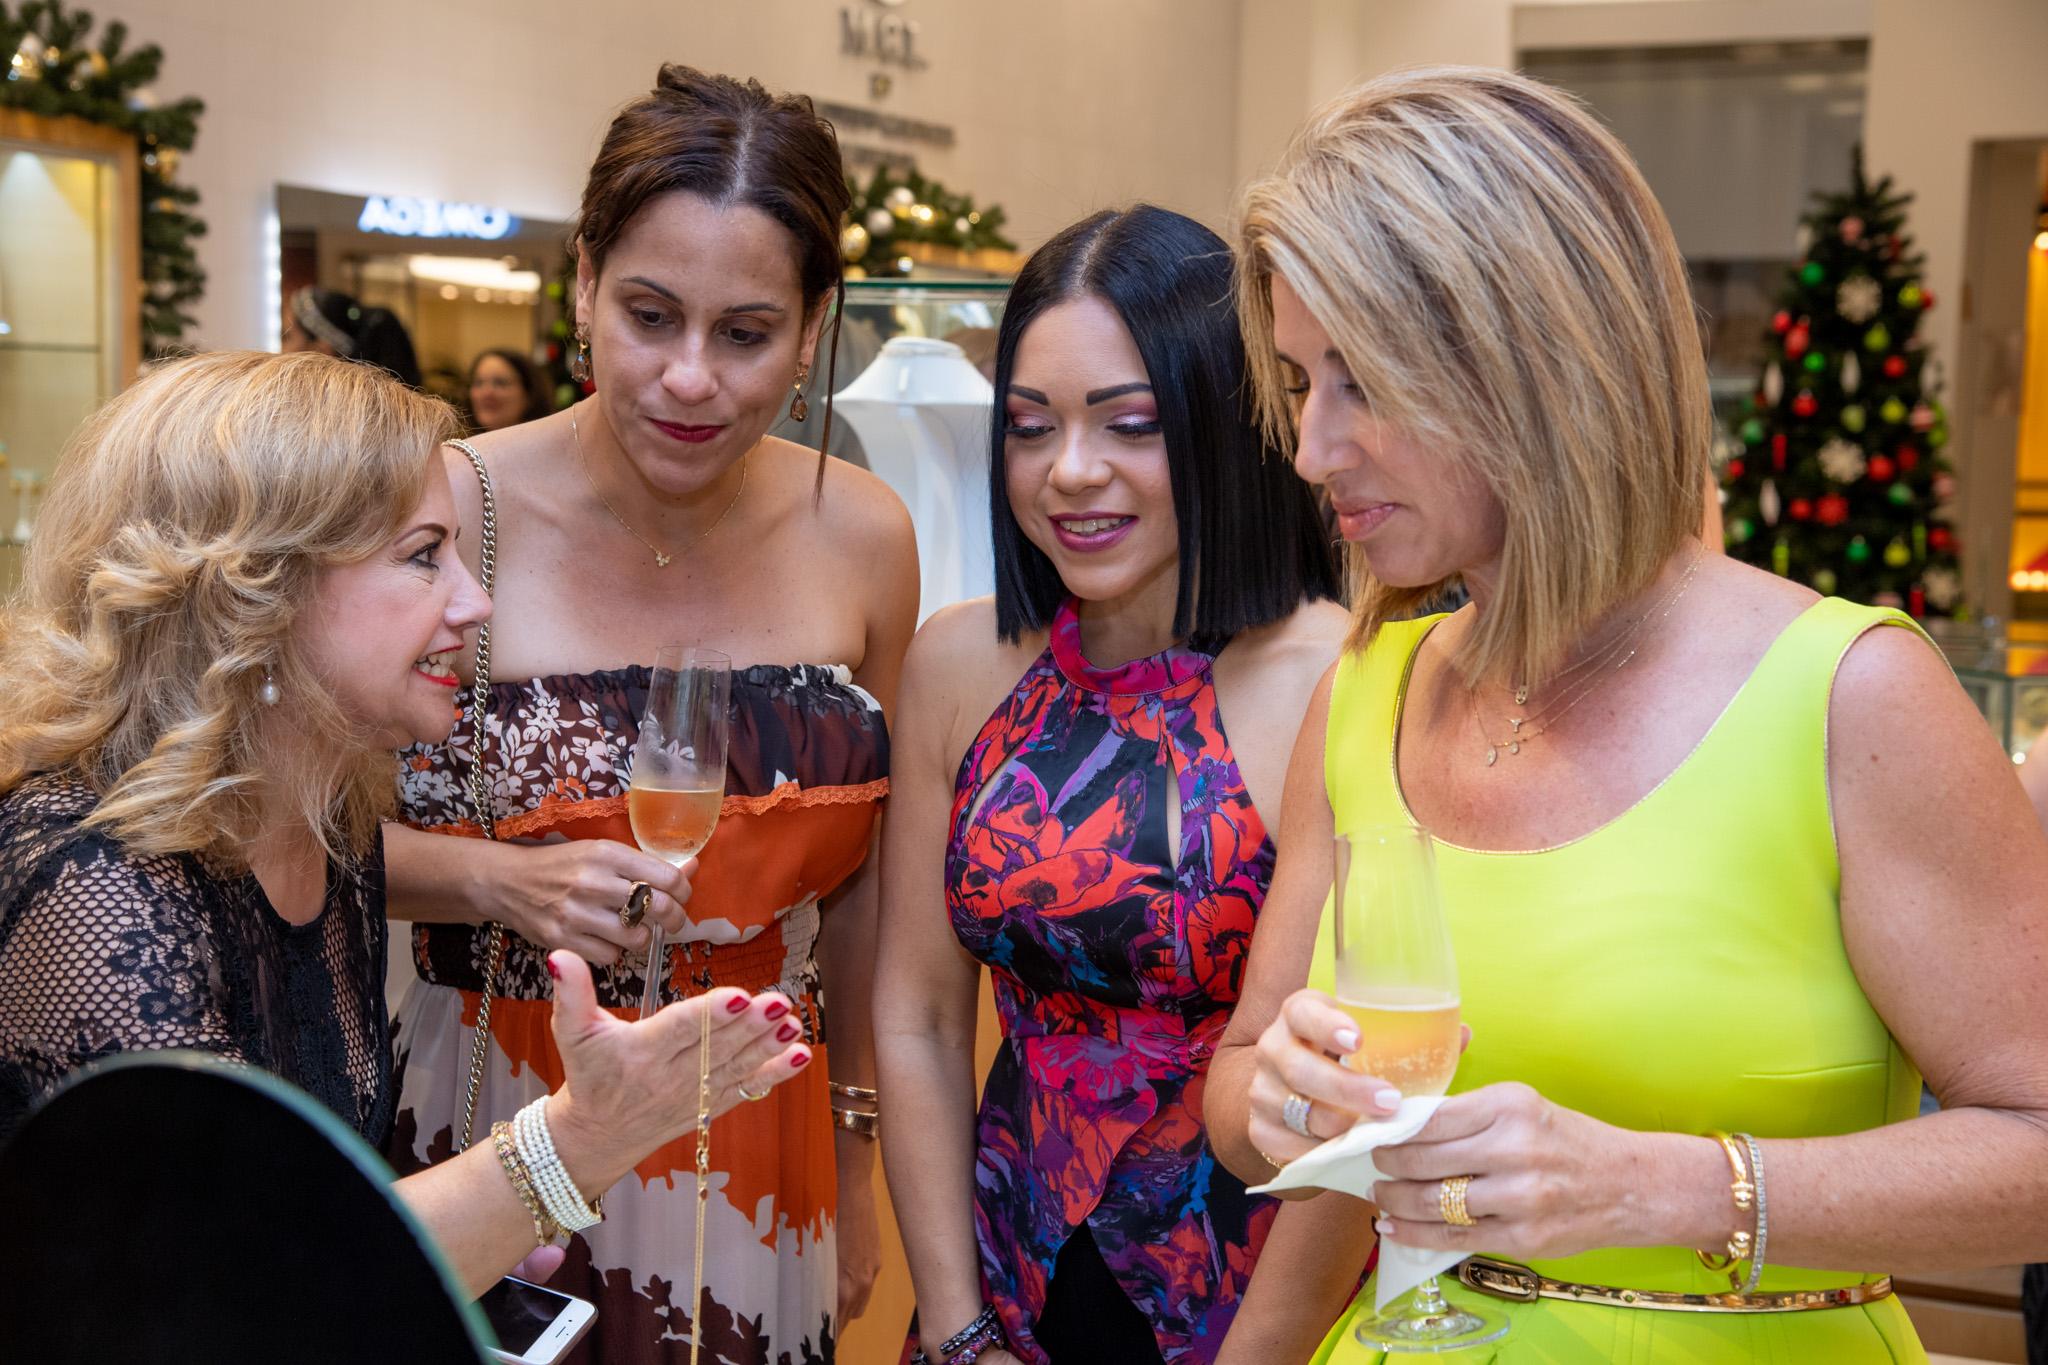 Elbita Gely, Fabiola Ansotegui, Brenda Ramos y Zulma Durán. (Suministrada)